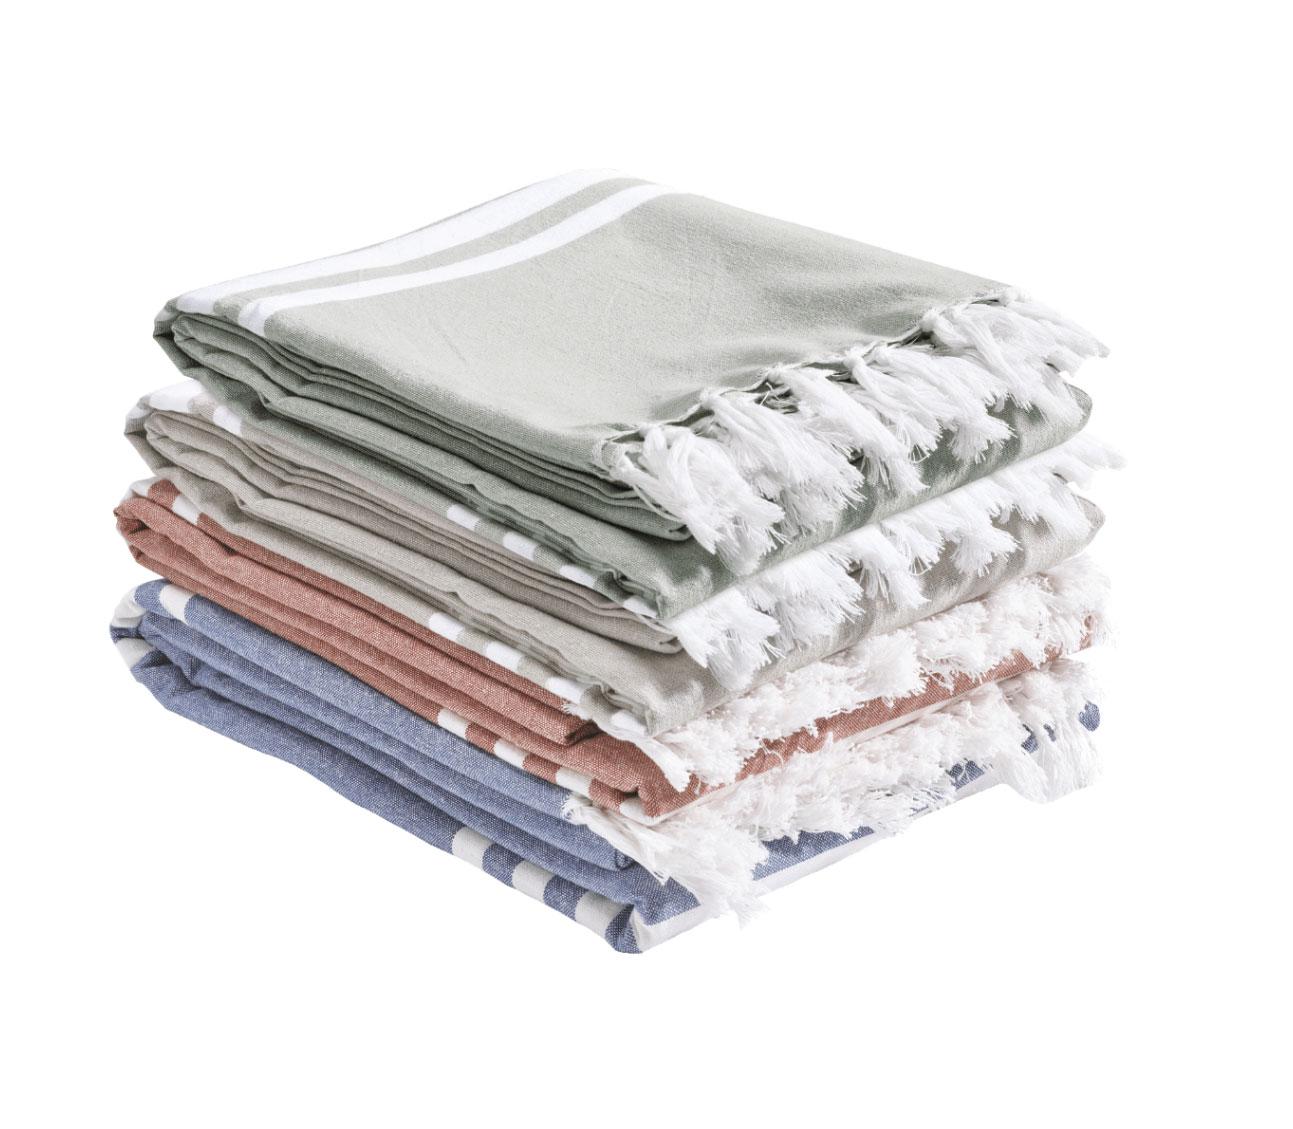 Cojín enrollable Exterior: 100% algodón orgánico. Relleno: 100% poliéster. Tamaño: 60 x 180 cm. Disponible en diferentes diseños. -10,00% 19,99 € 17,99